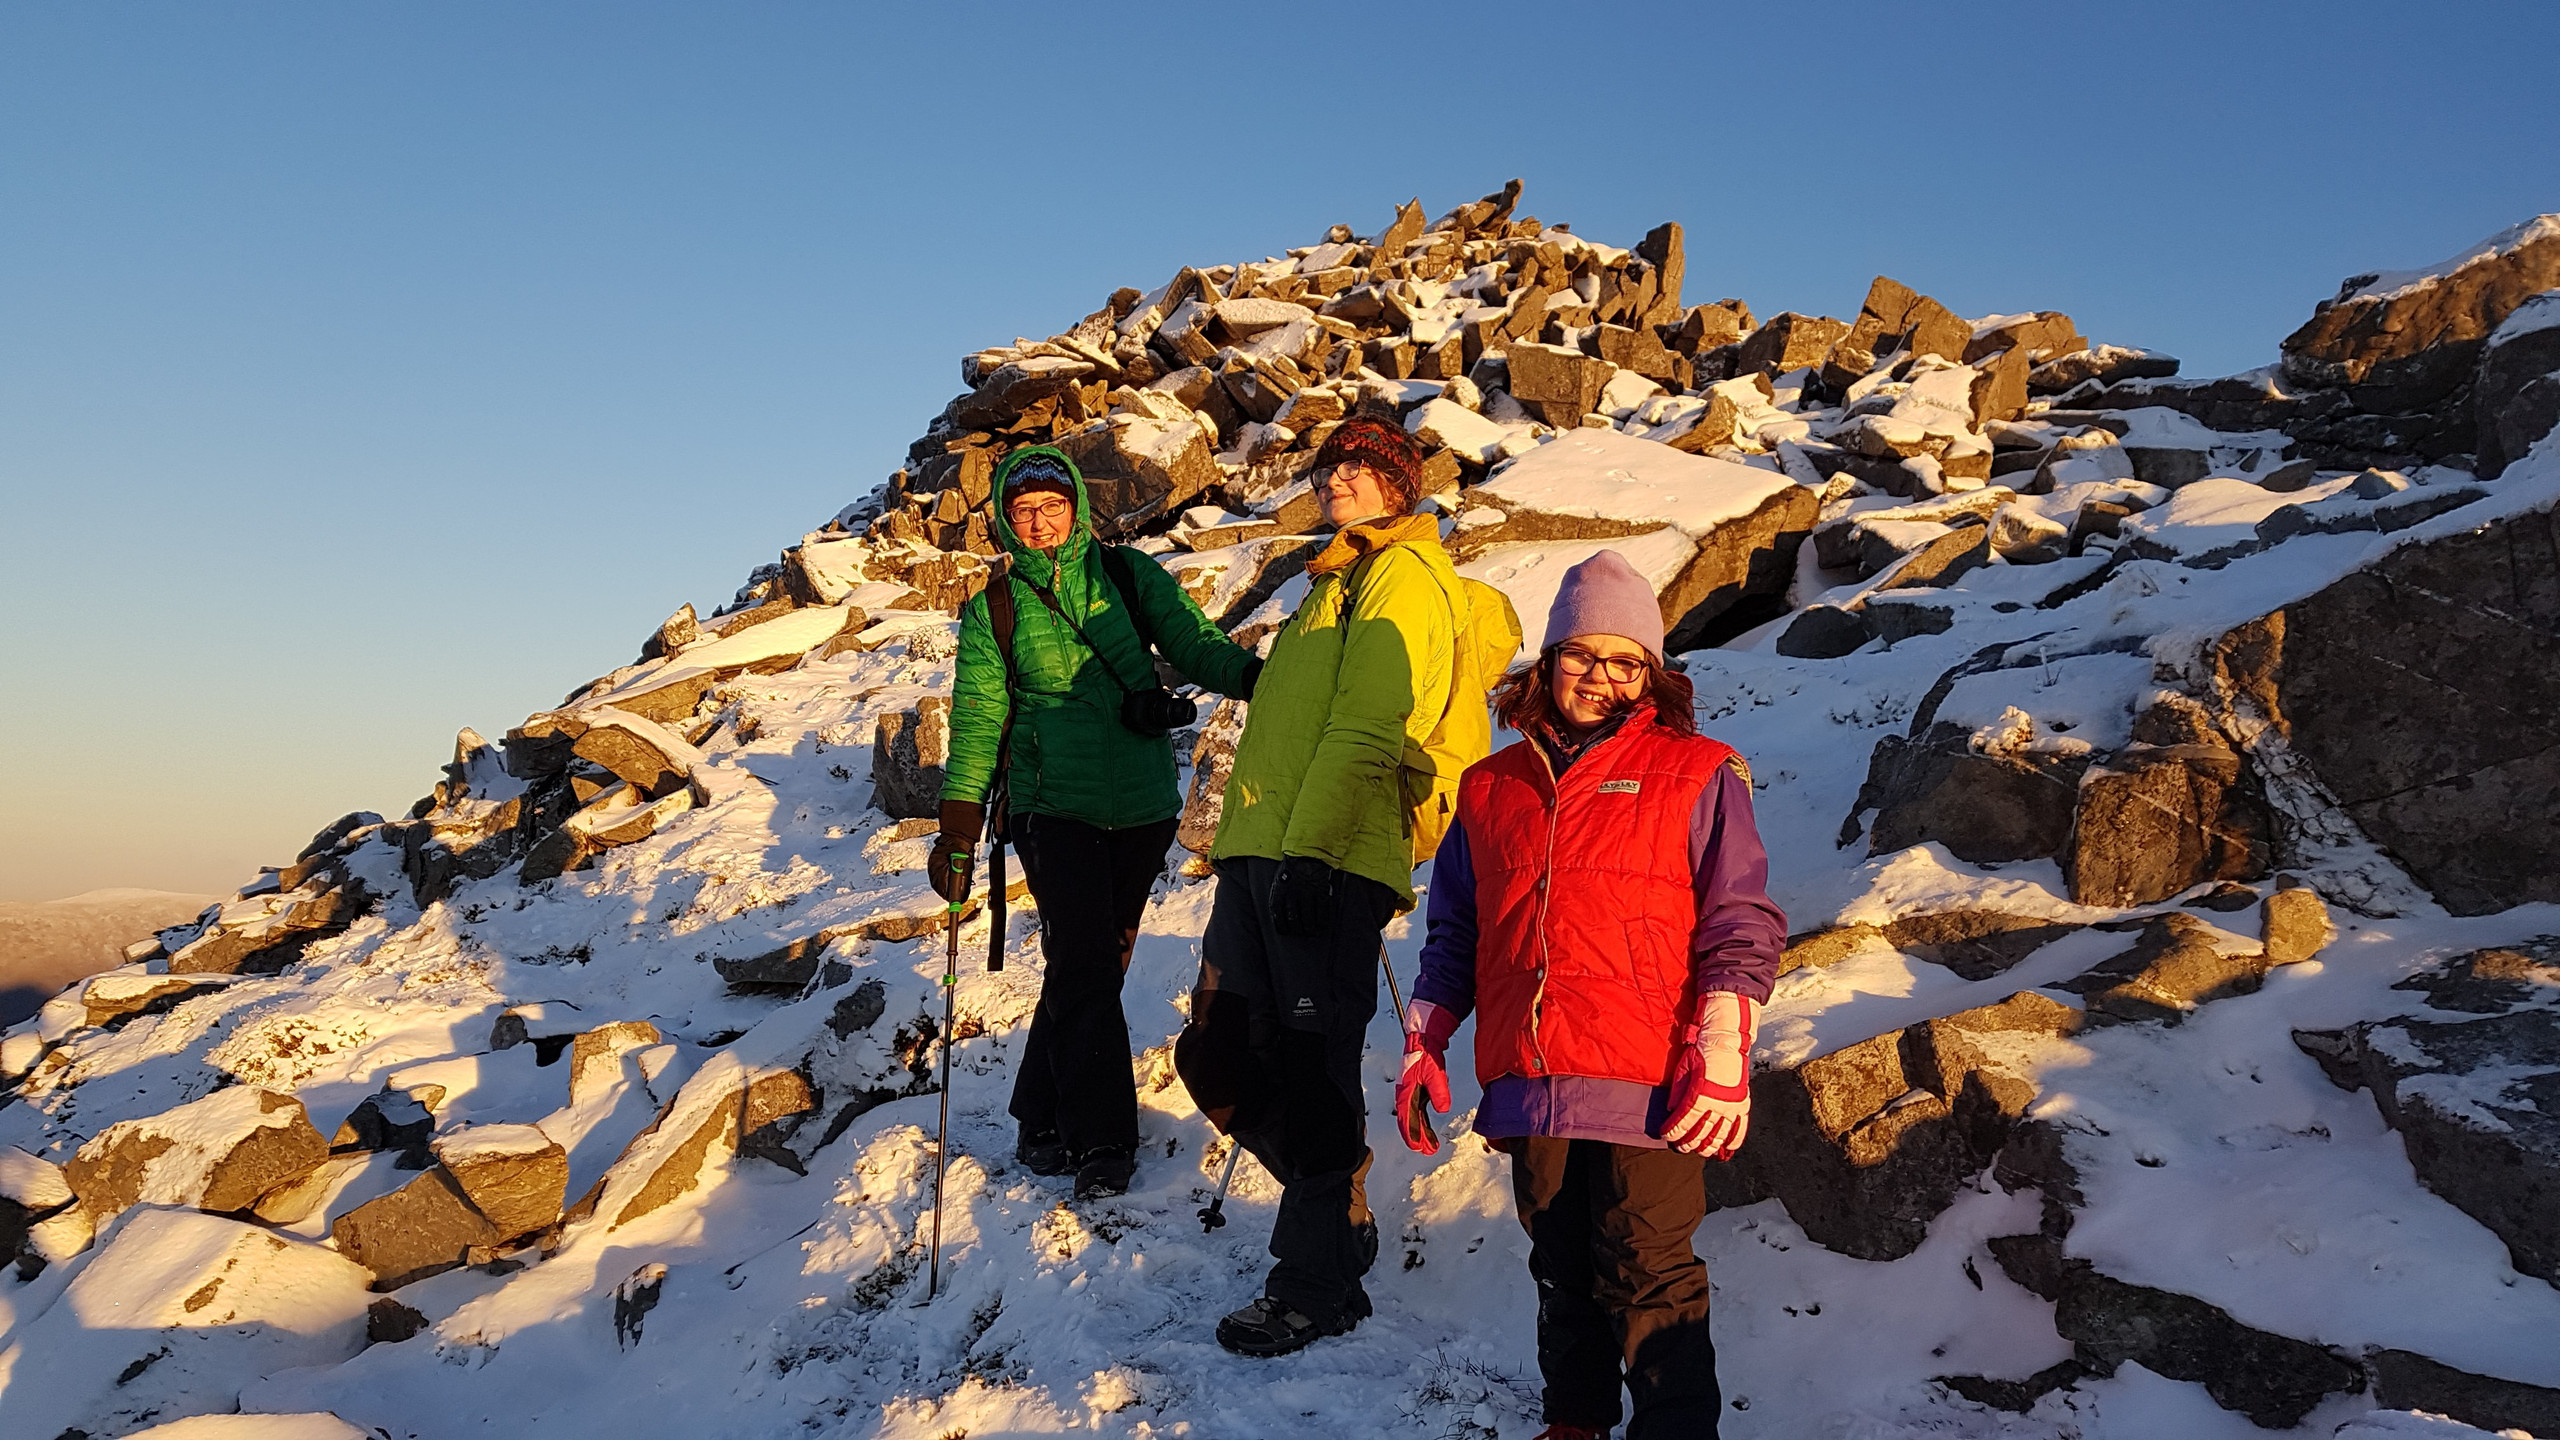 The final descent from Elidir Fawr